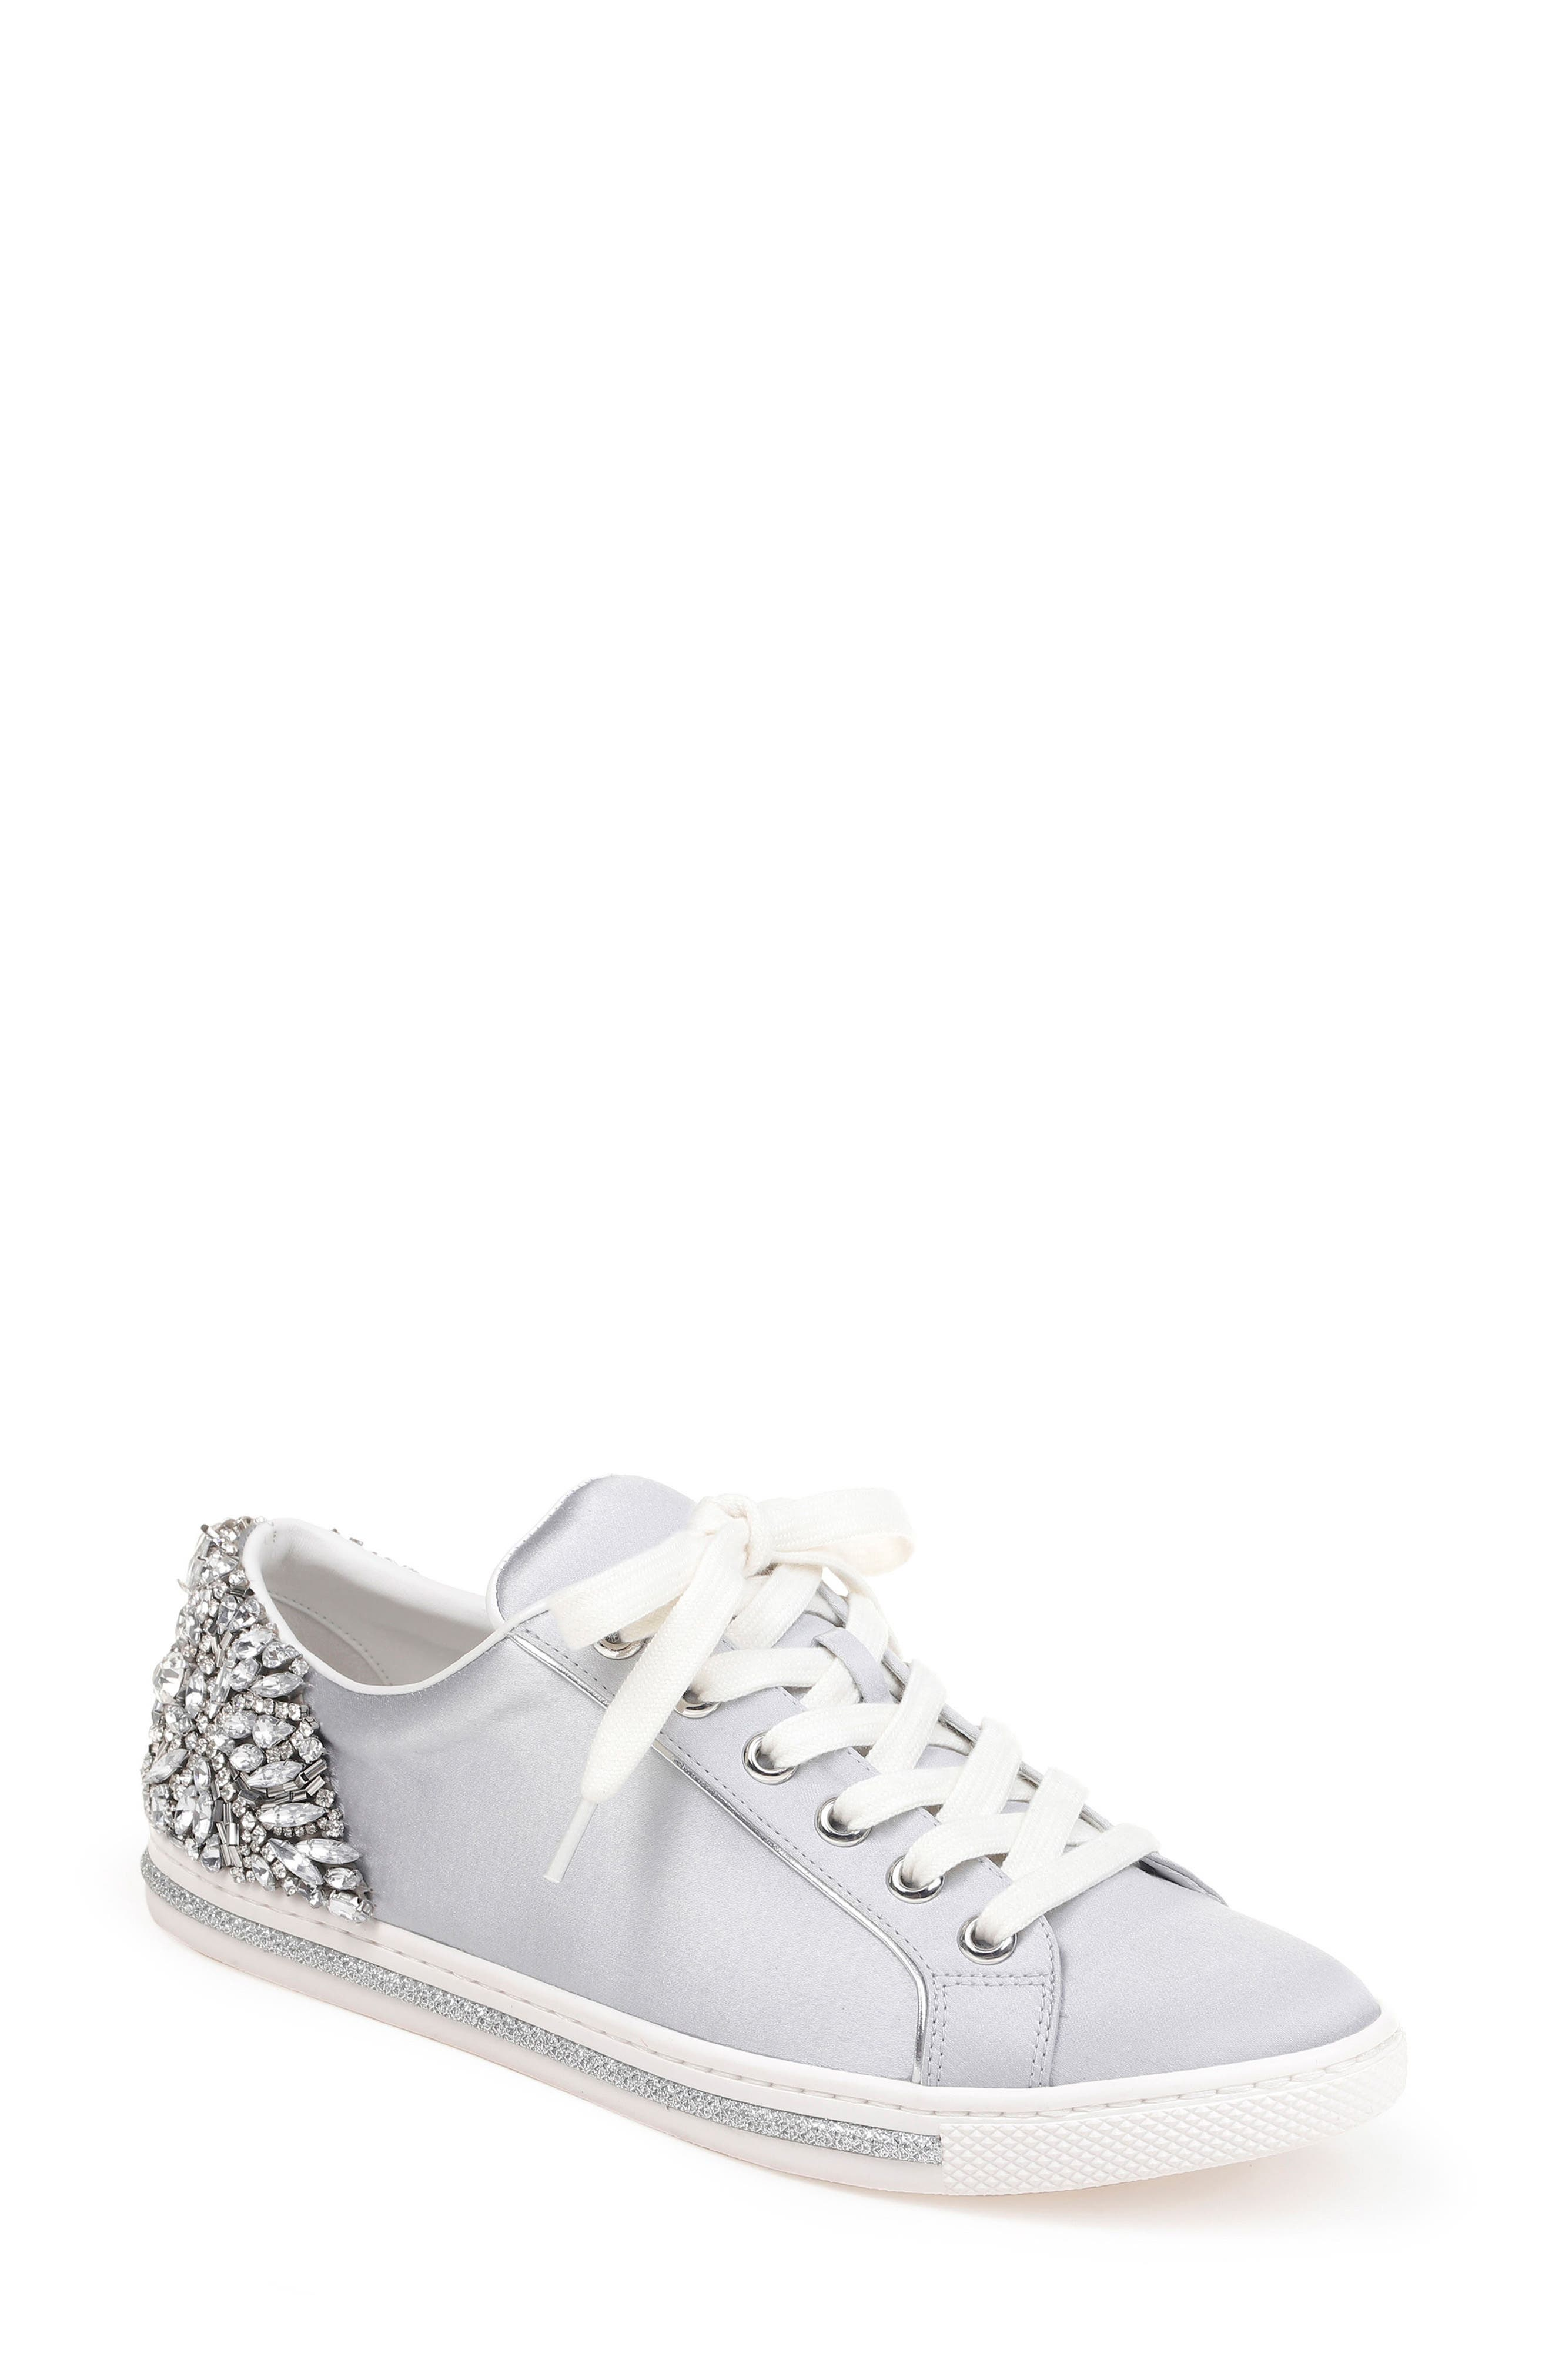 Badgley Mischka Shirley Crystal Embellished Sneaker,                             Main thumbnail 1, color,                             045